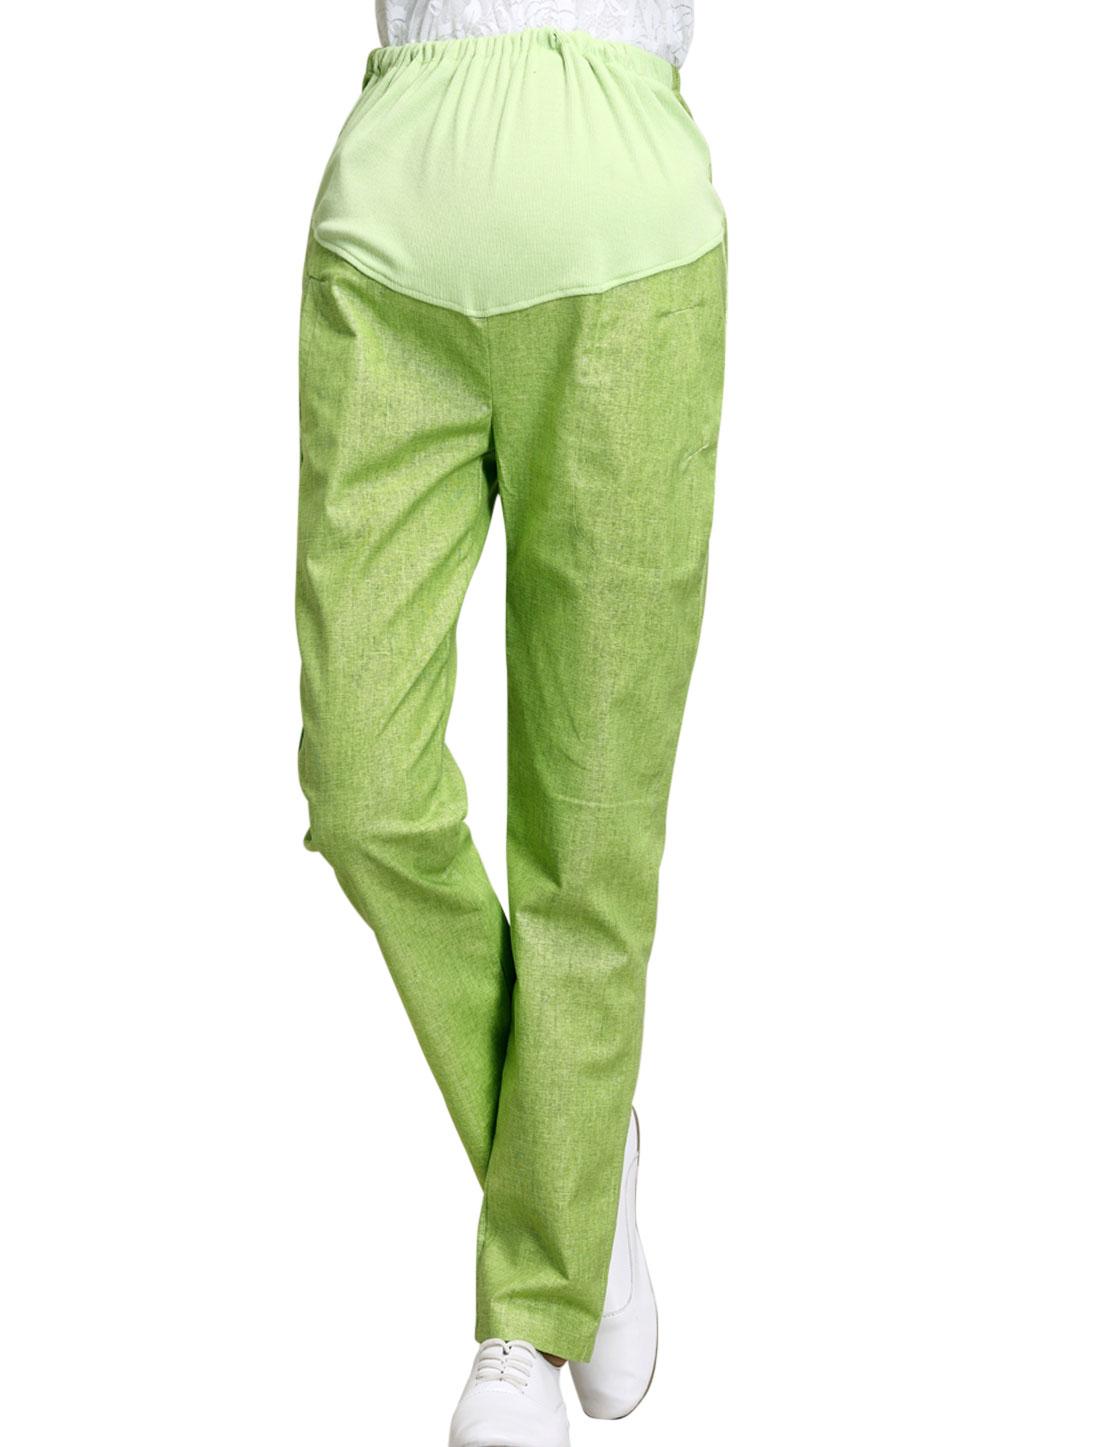 Maternity Drawstring Button Adjustable Waist Slant Pockets Pants Lime XS